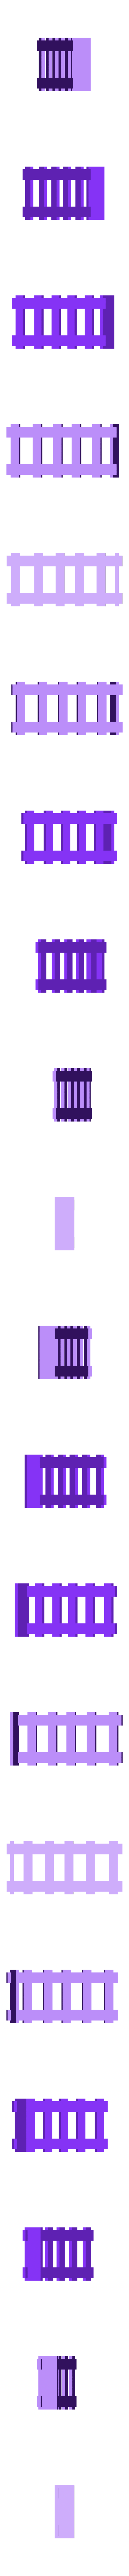 Modular_Ladder.stl Download free STL file Modular Mech Buildings • 3D printable object, mrhers2